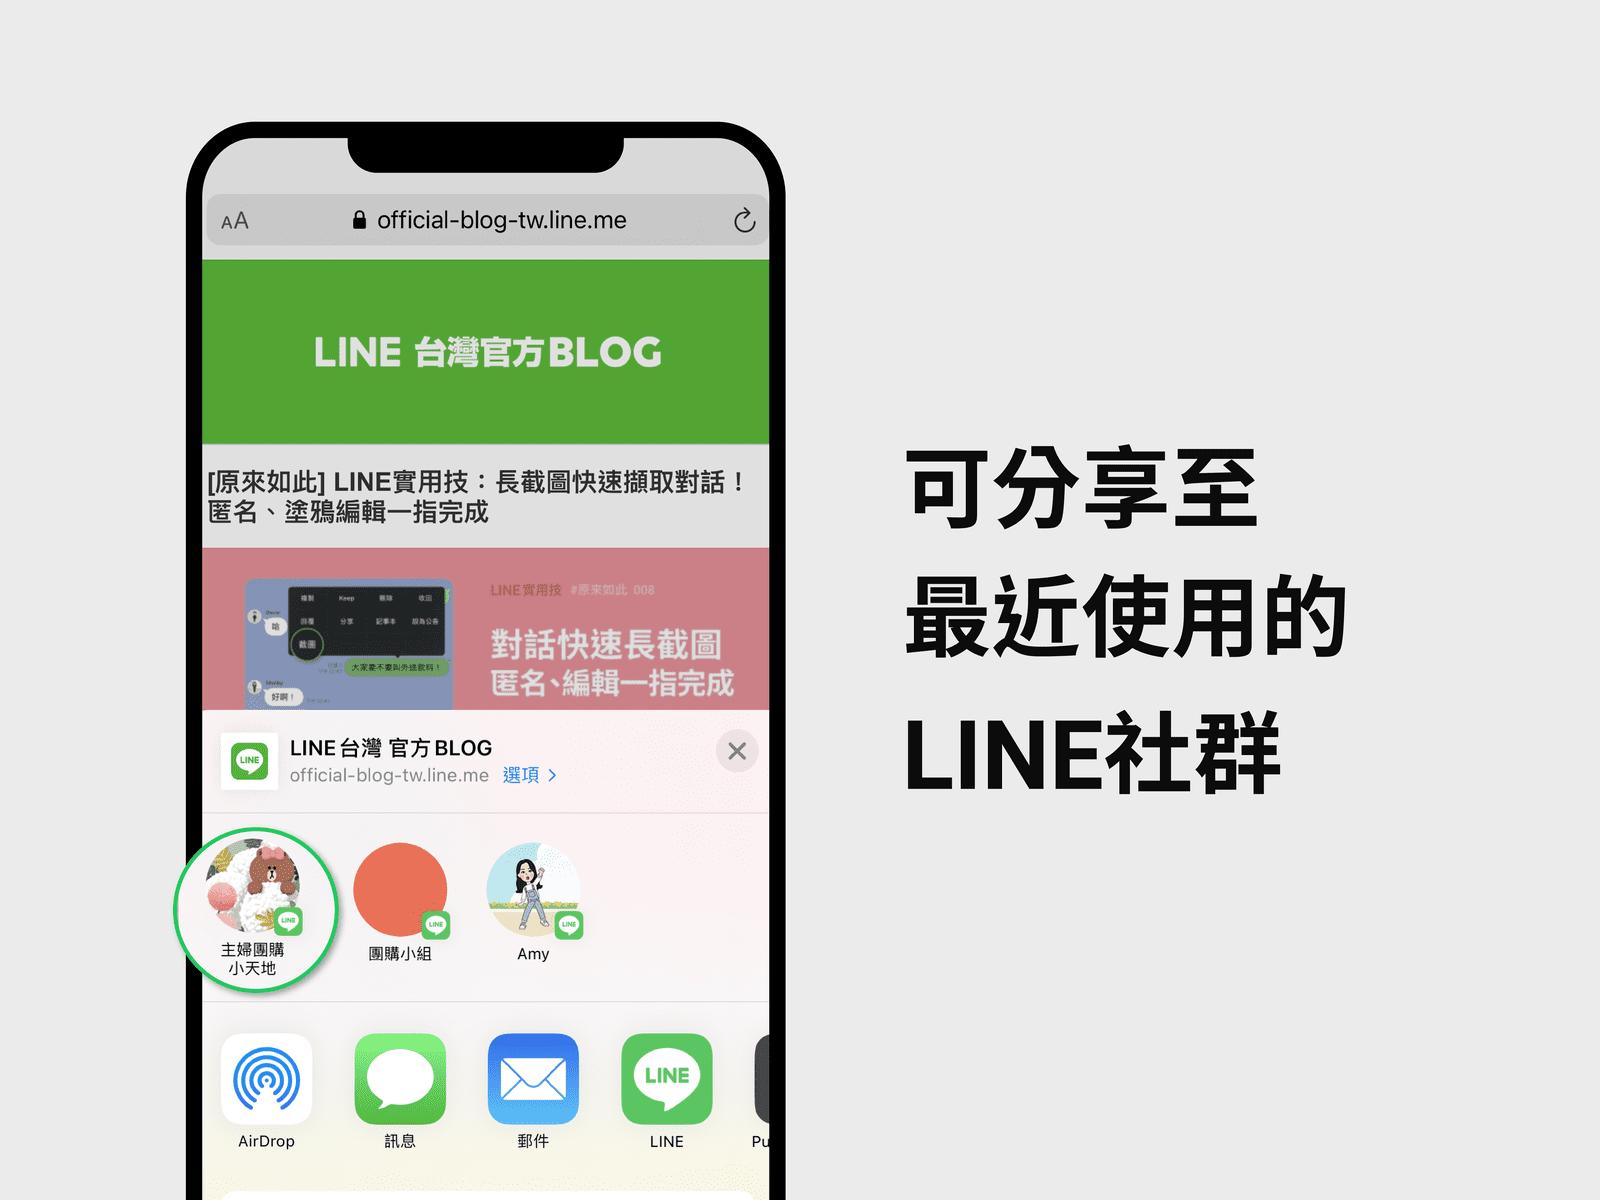 LINE社群 / 分享路徑支援LINE社群聊天室